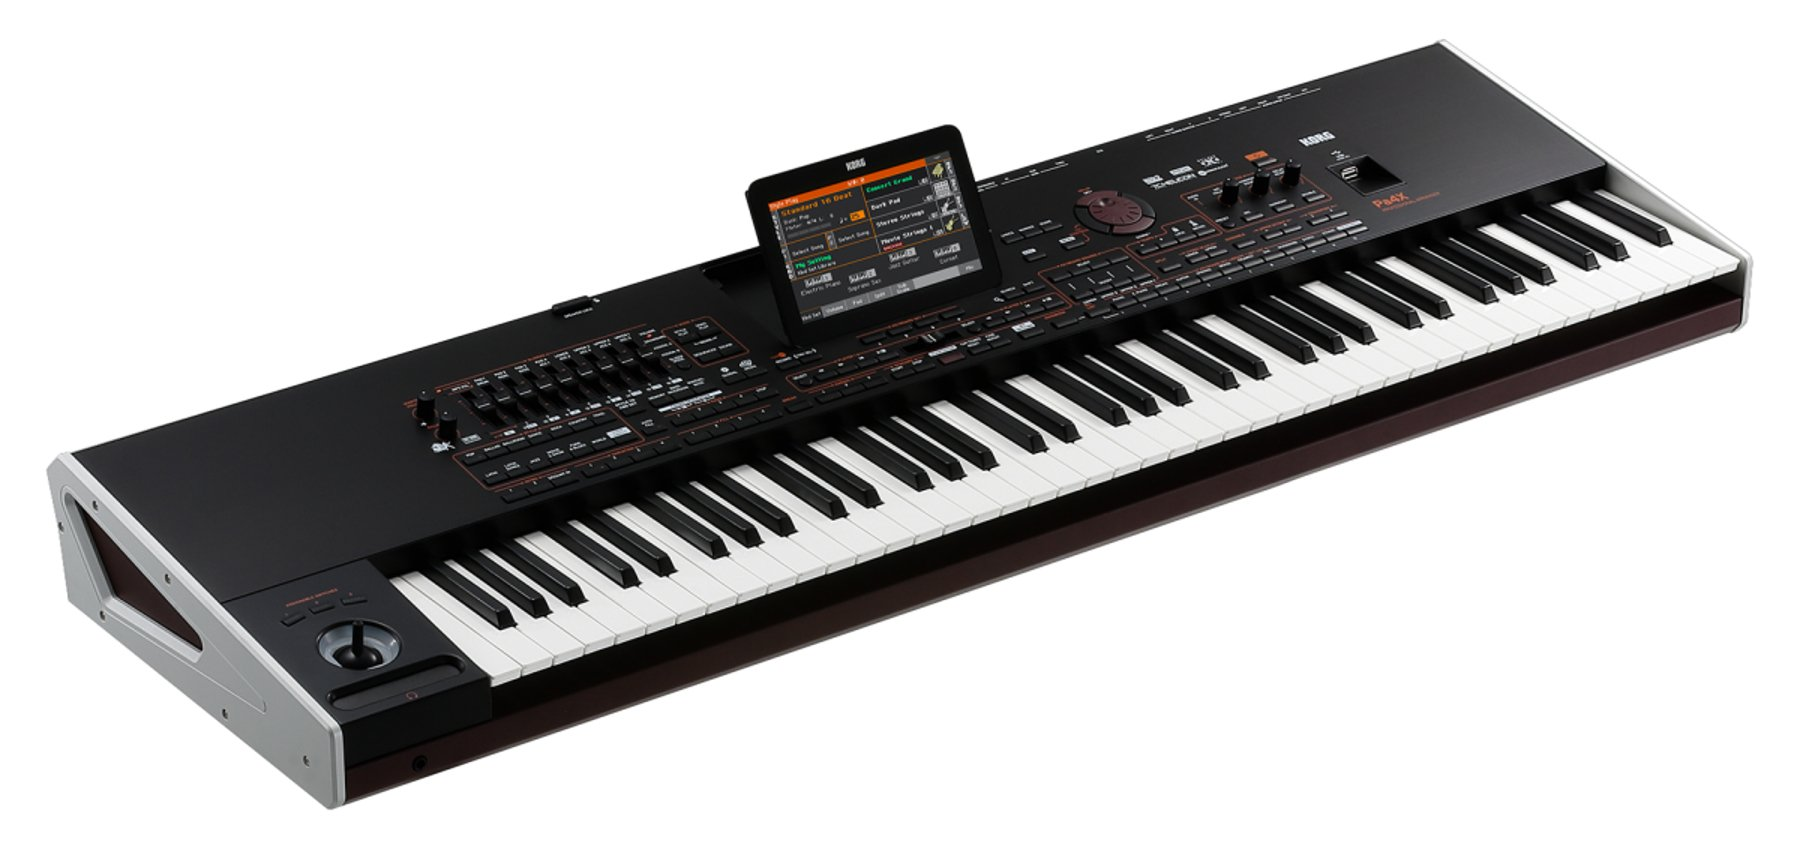 Pa4X 76-Key Professional Arranger Keyboard by Korg, PA4X76 | Full